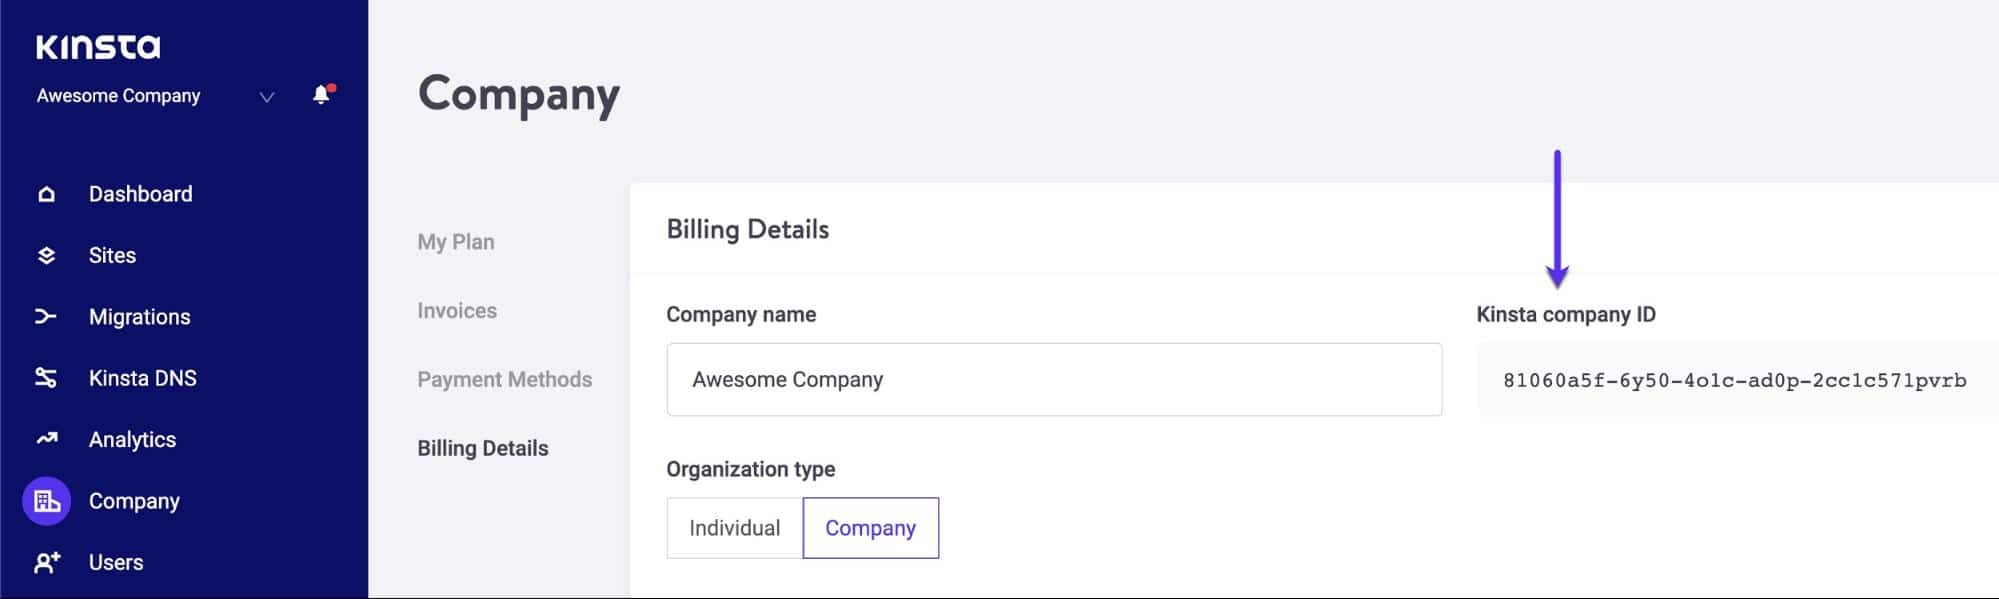 Kinsta-Firmen-ID im MyKinsta-Dashboard